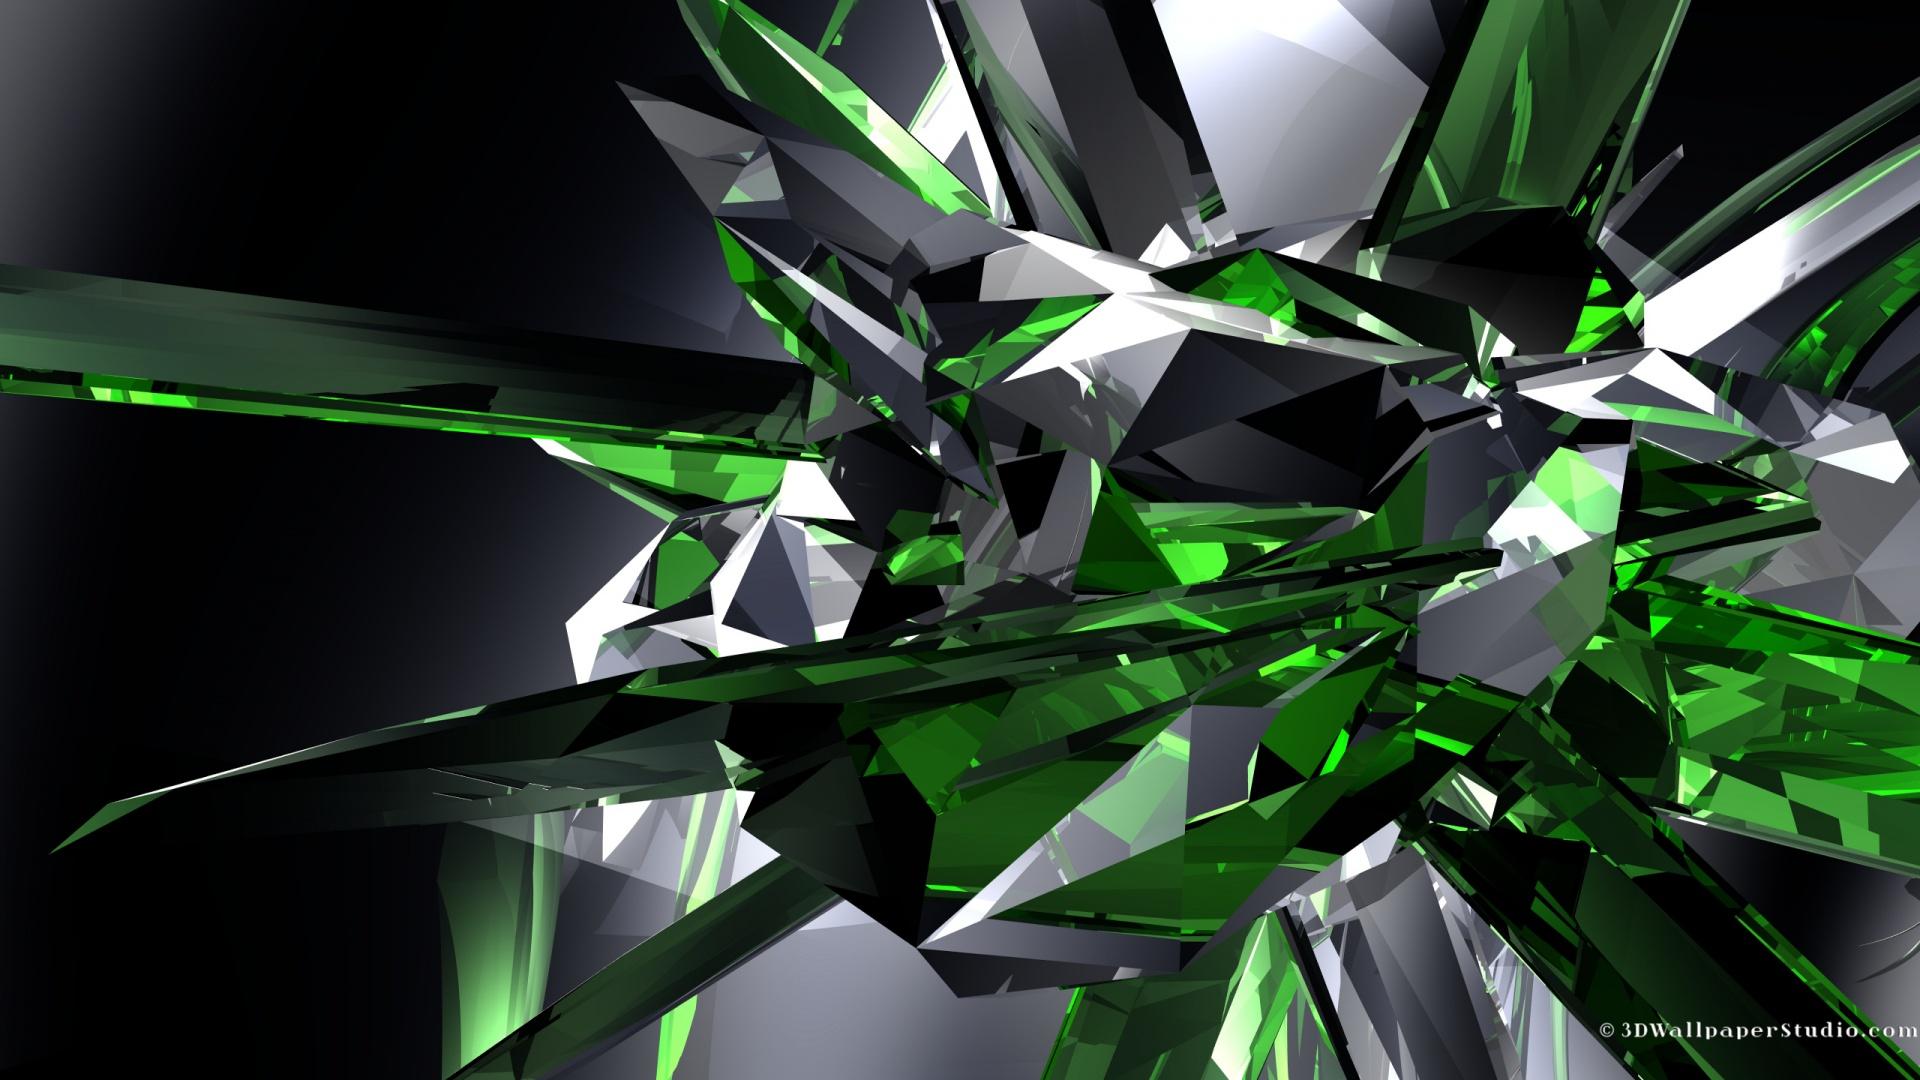 emerald crystals wallpaper linux wallpapersjpg 1920x1080